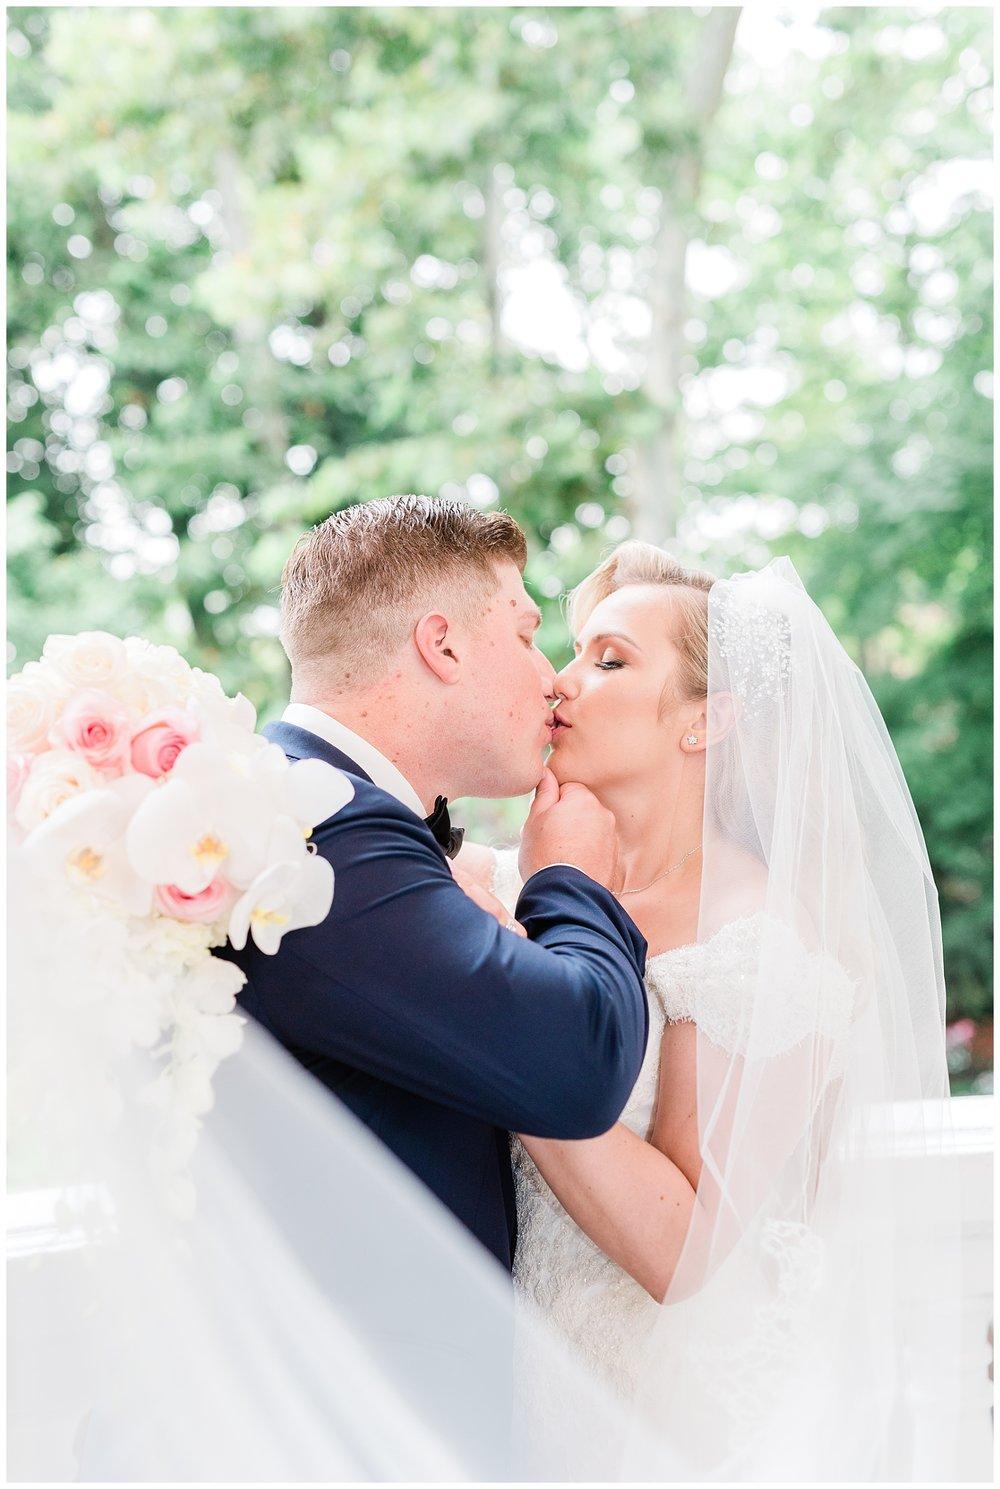 naninas-in-the-park-belleville-nj-wedding-photographer-photo_0085.jpg